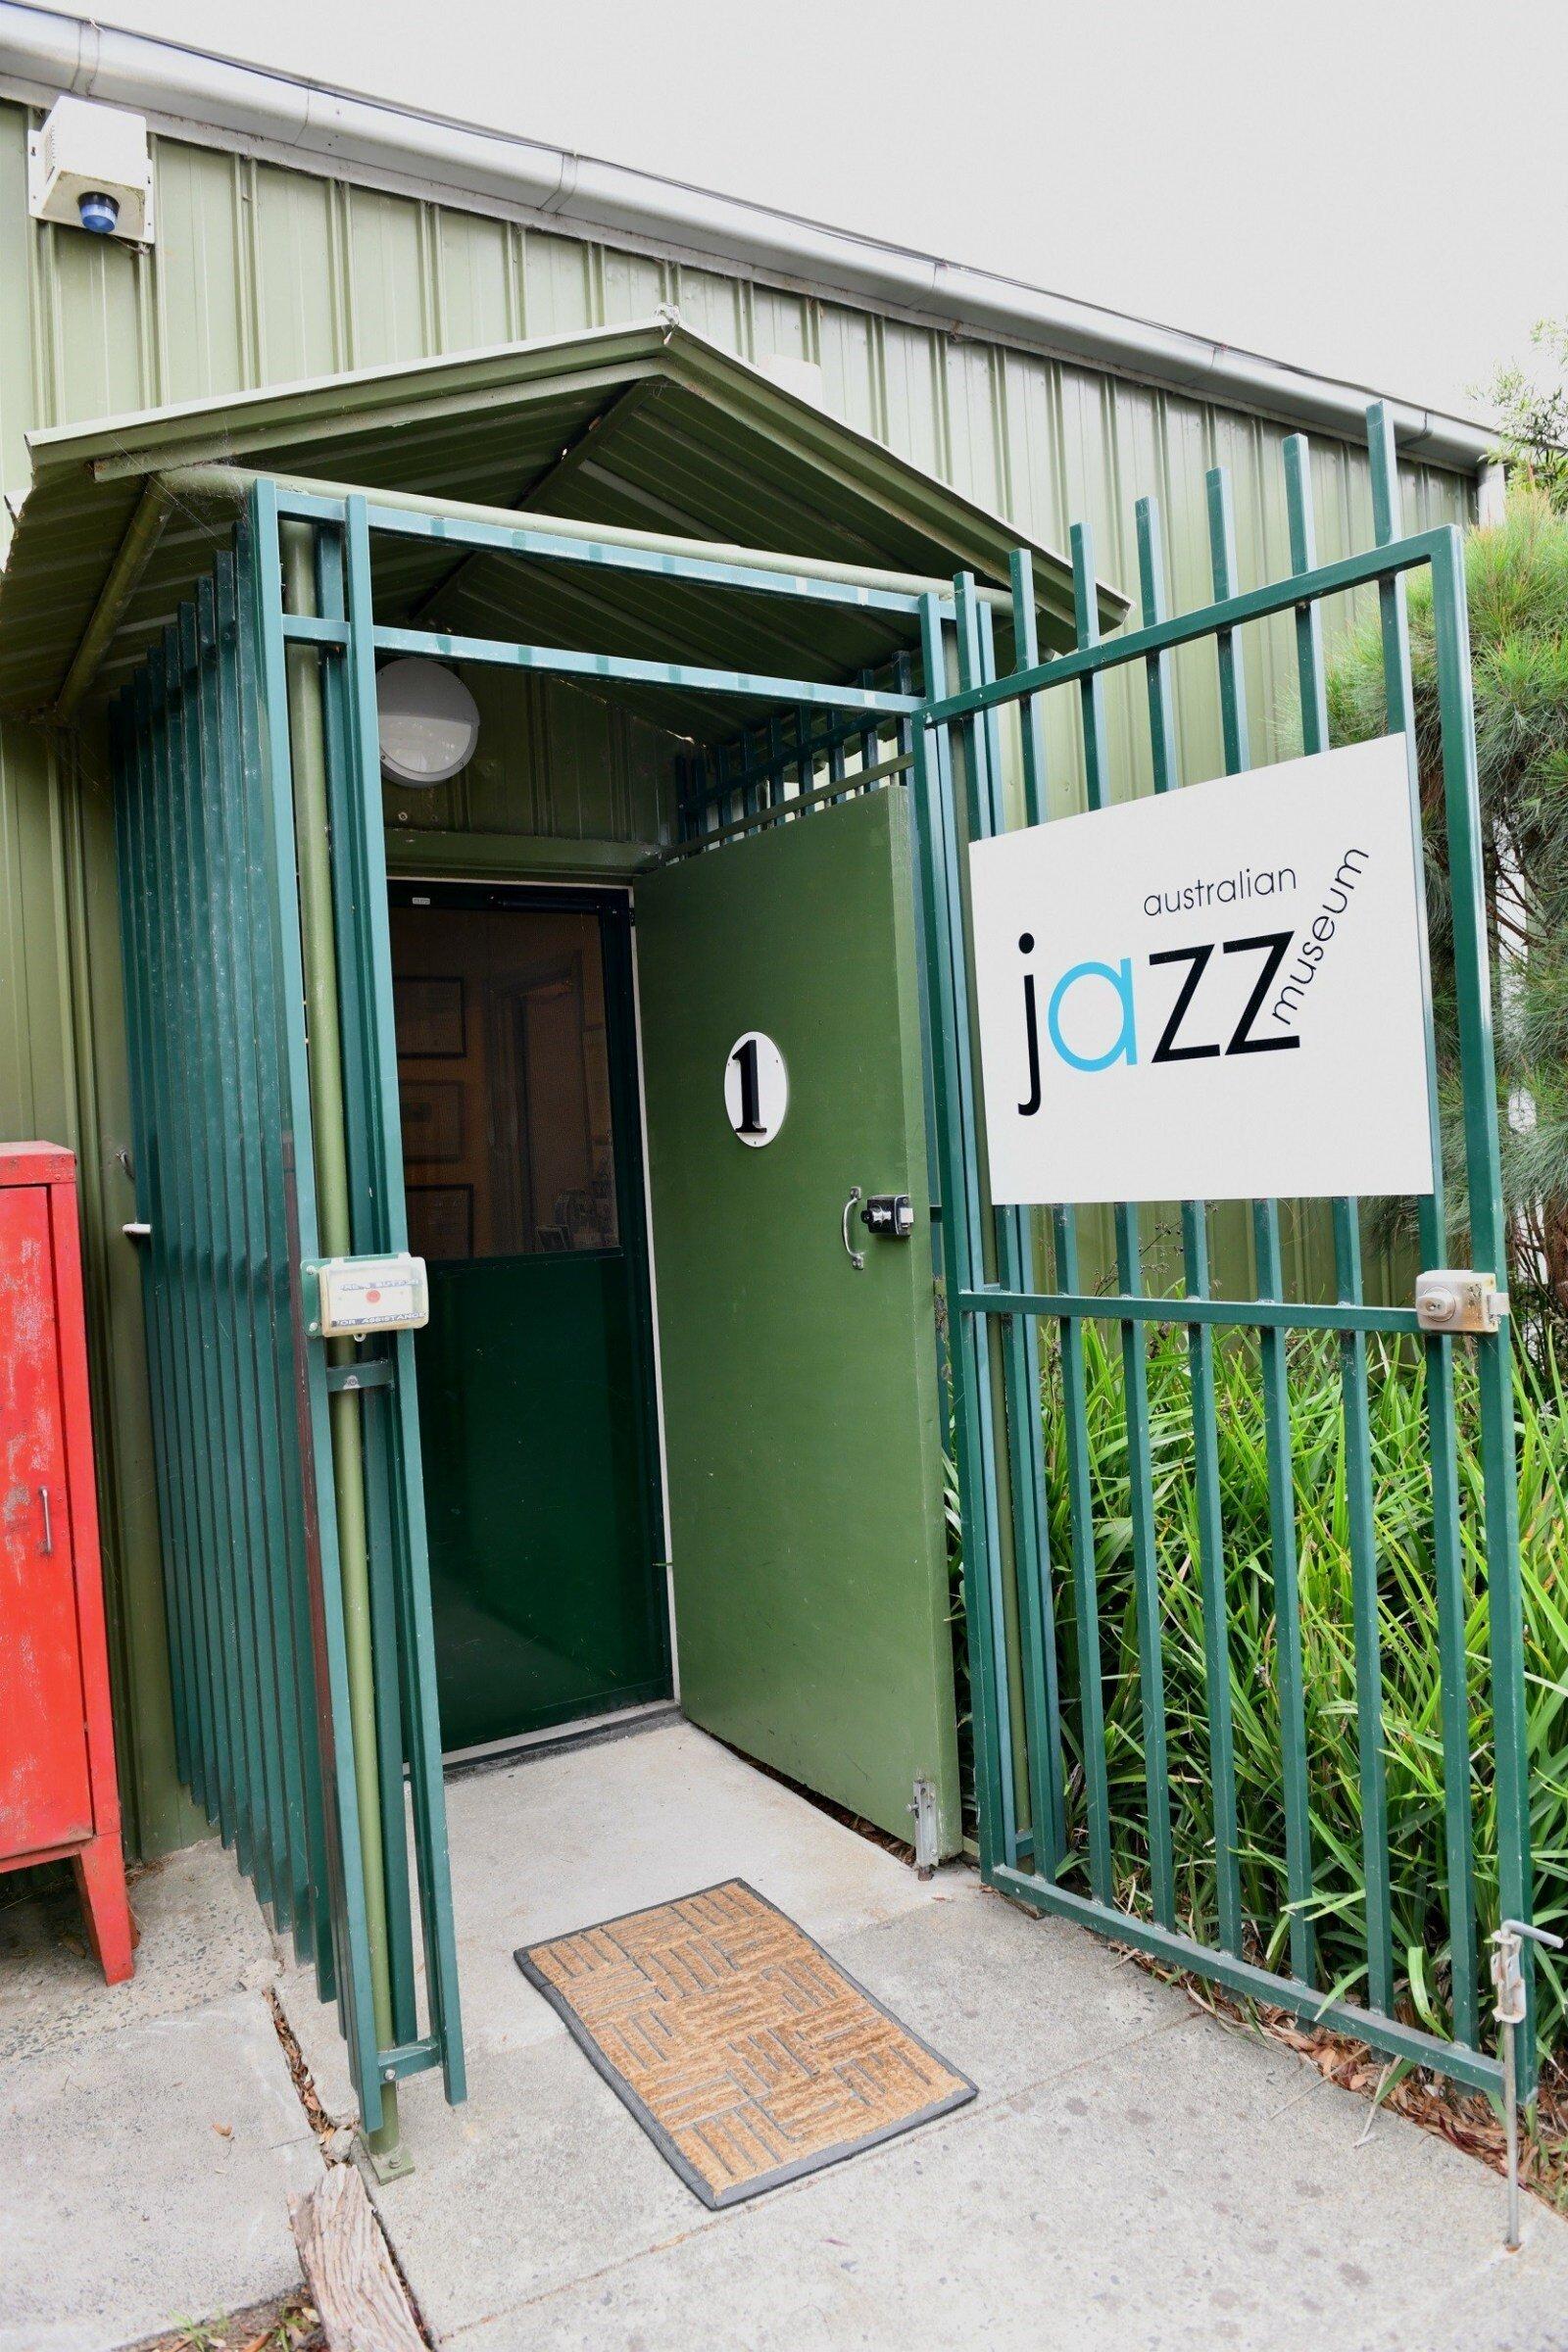 The Australian Jazz Museum